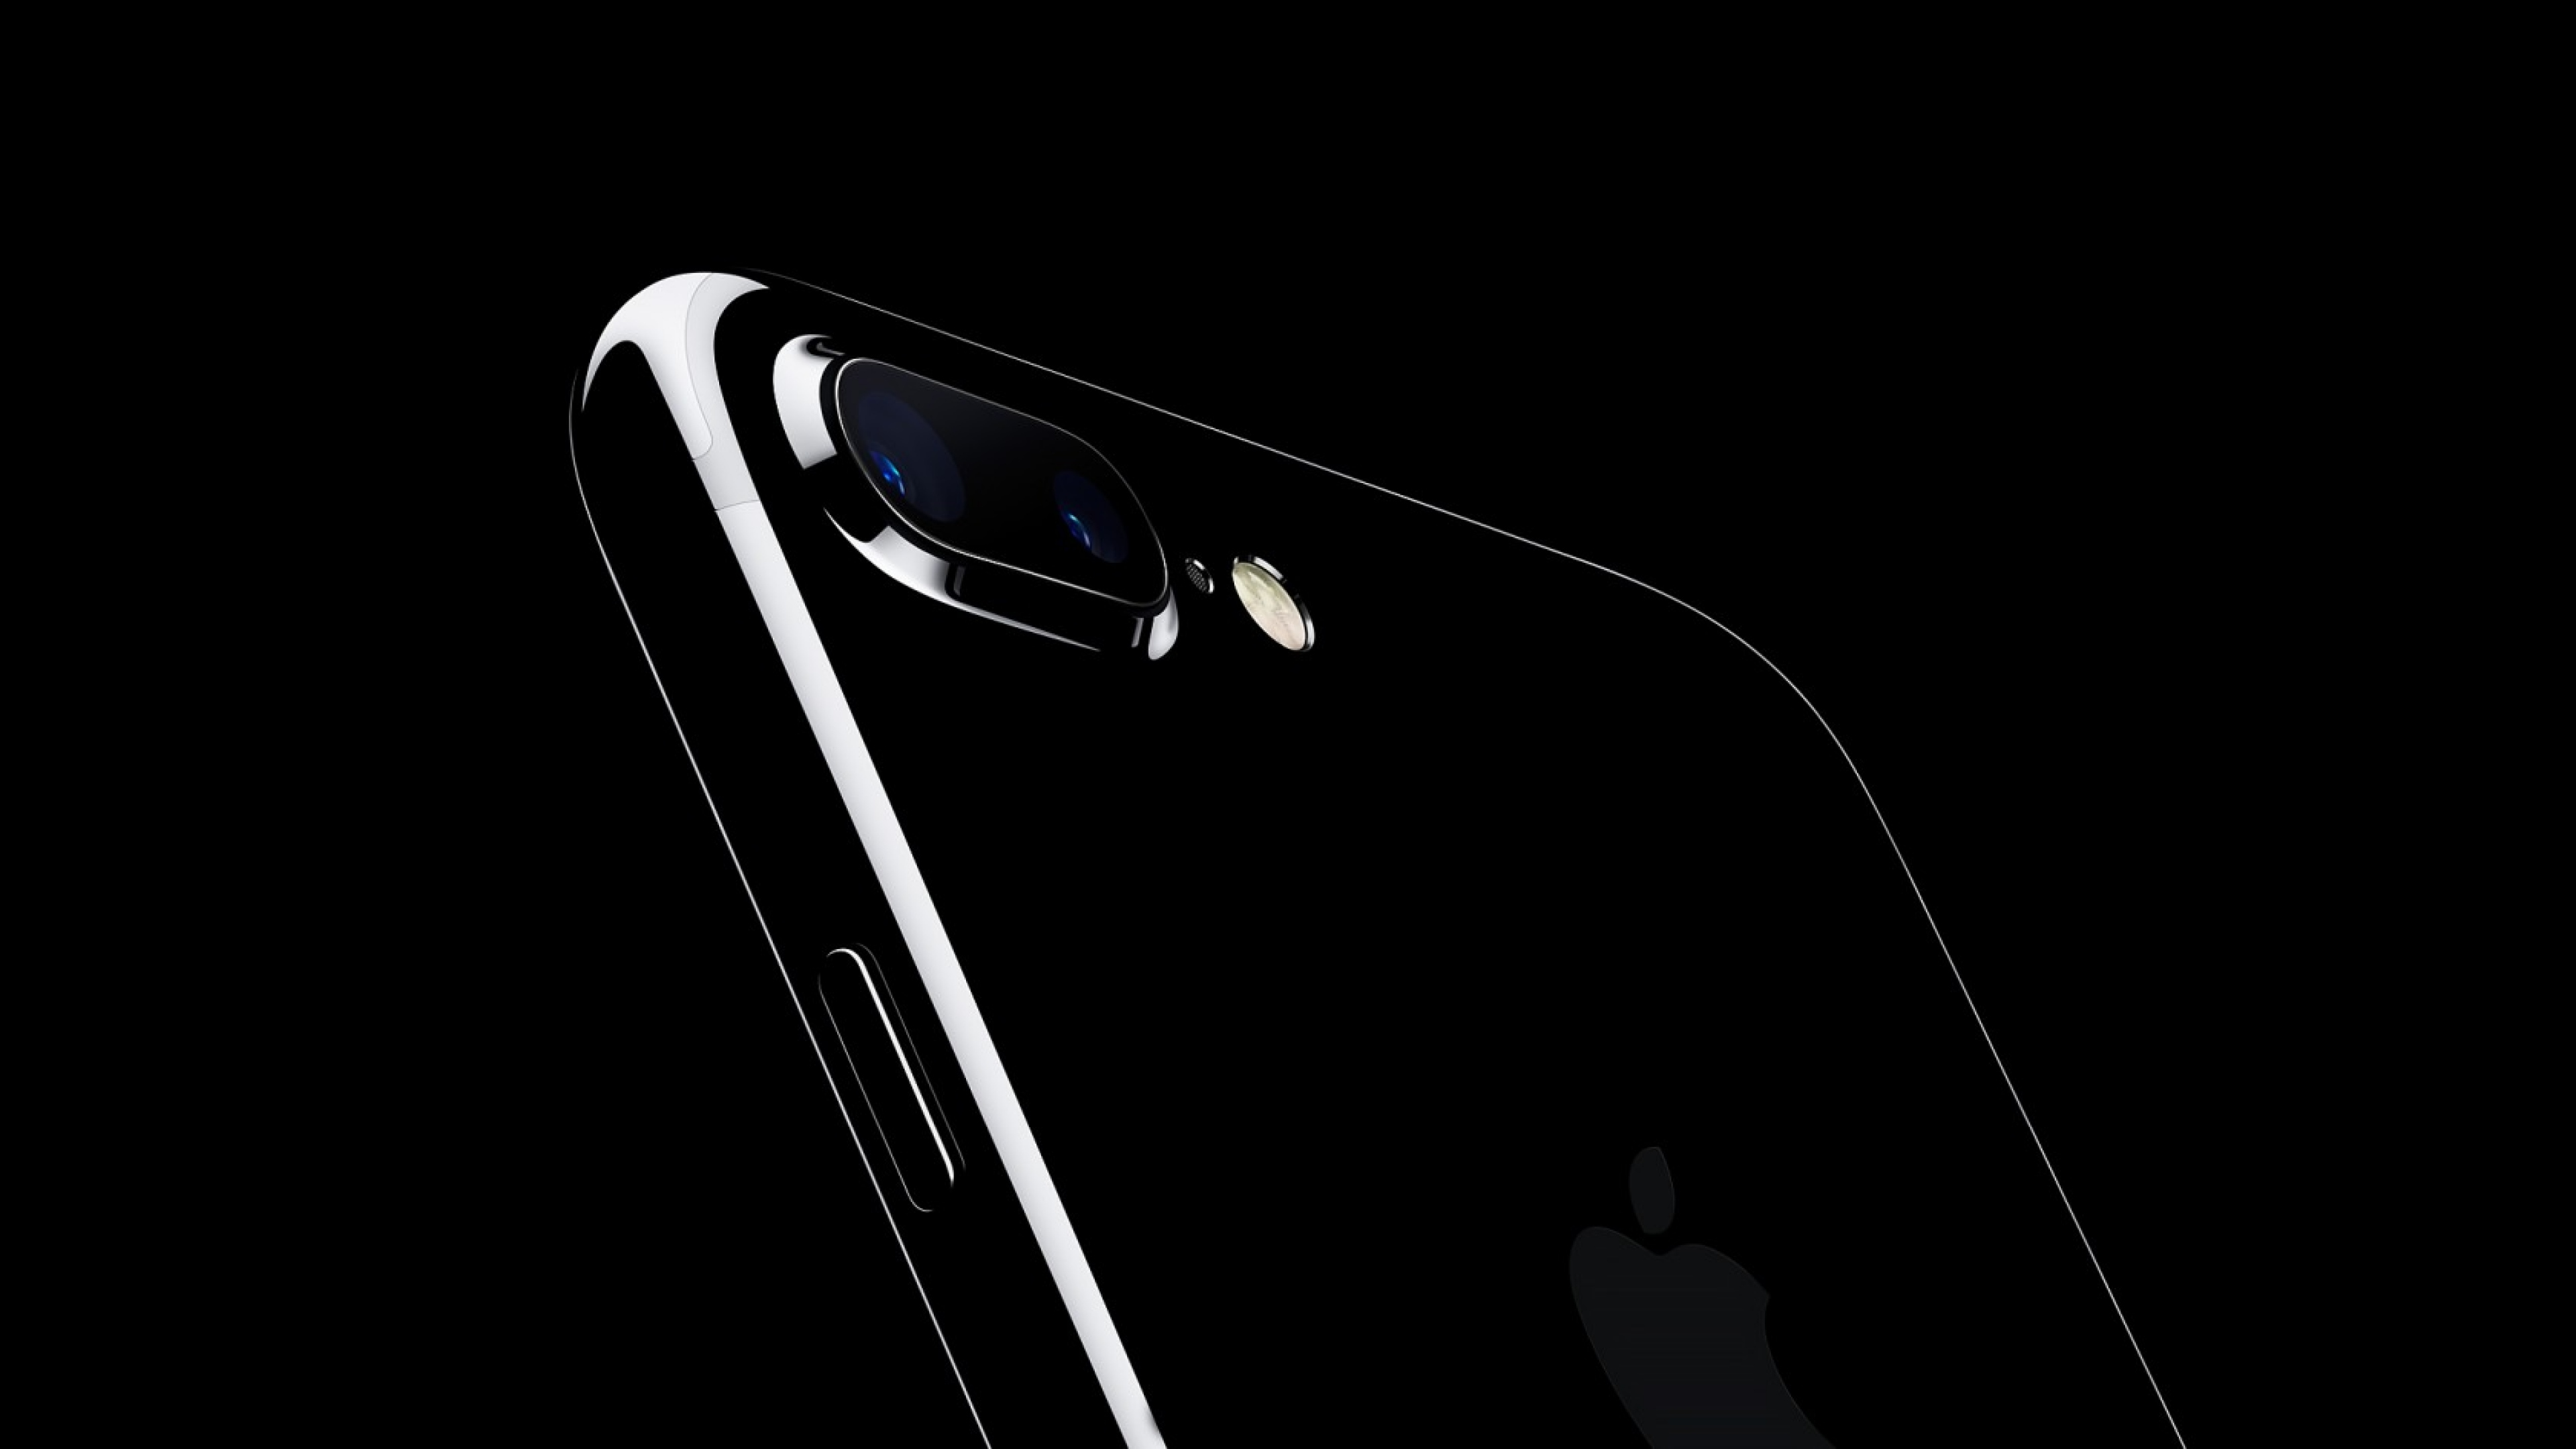 Iphone 7 Wallpaper Black 4k